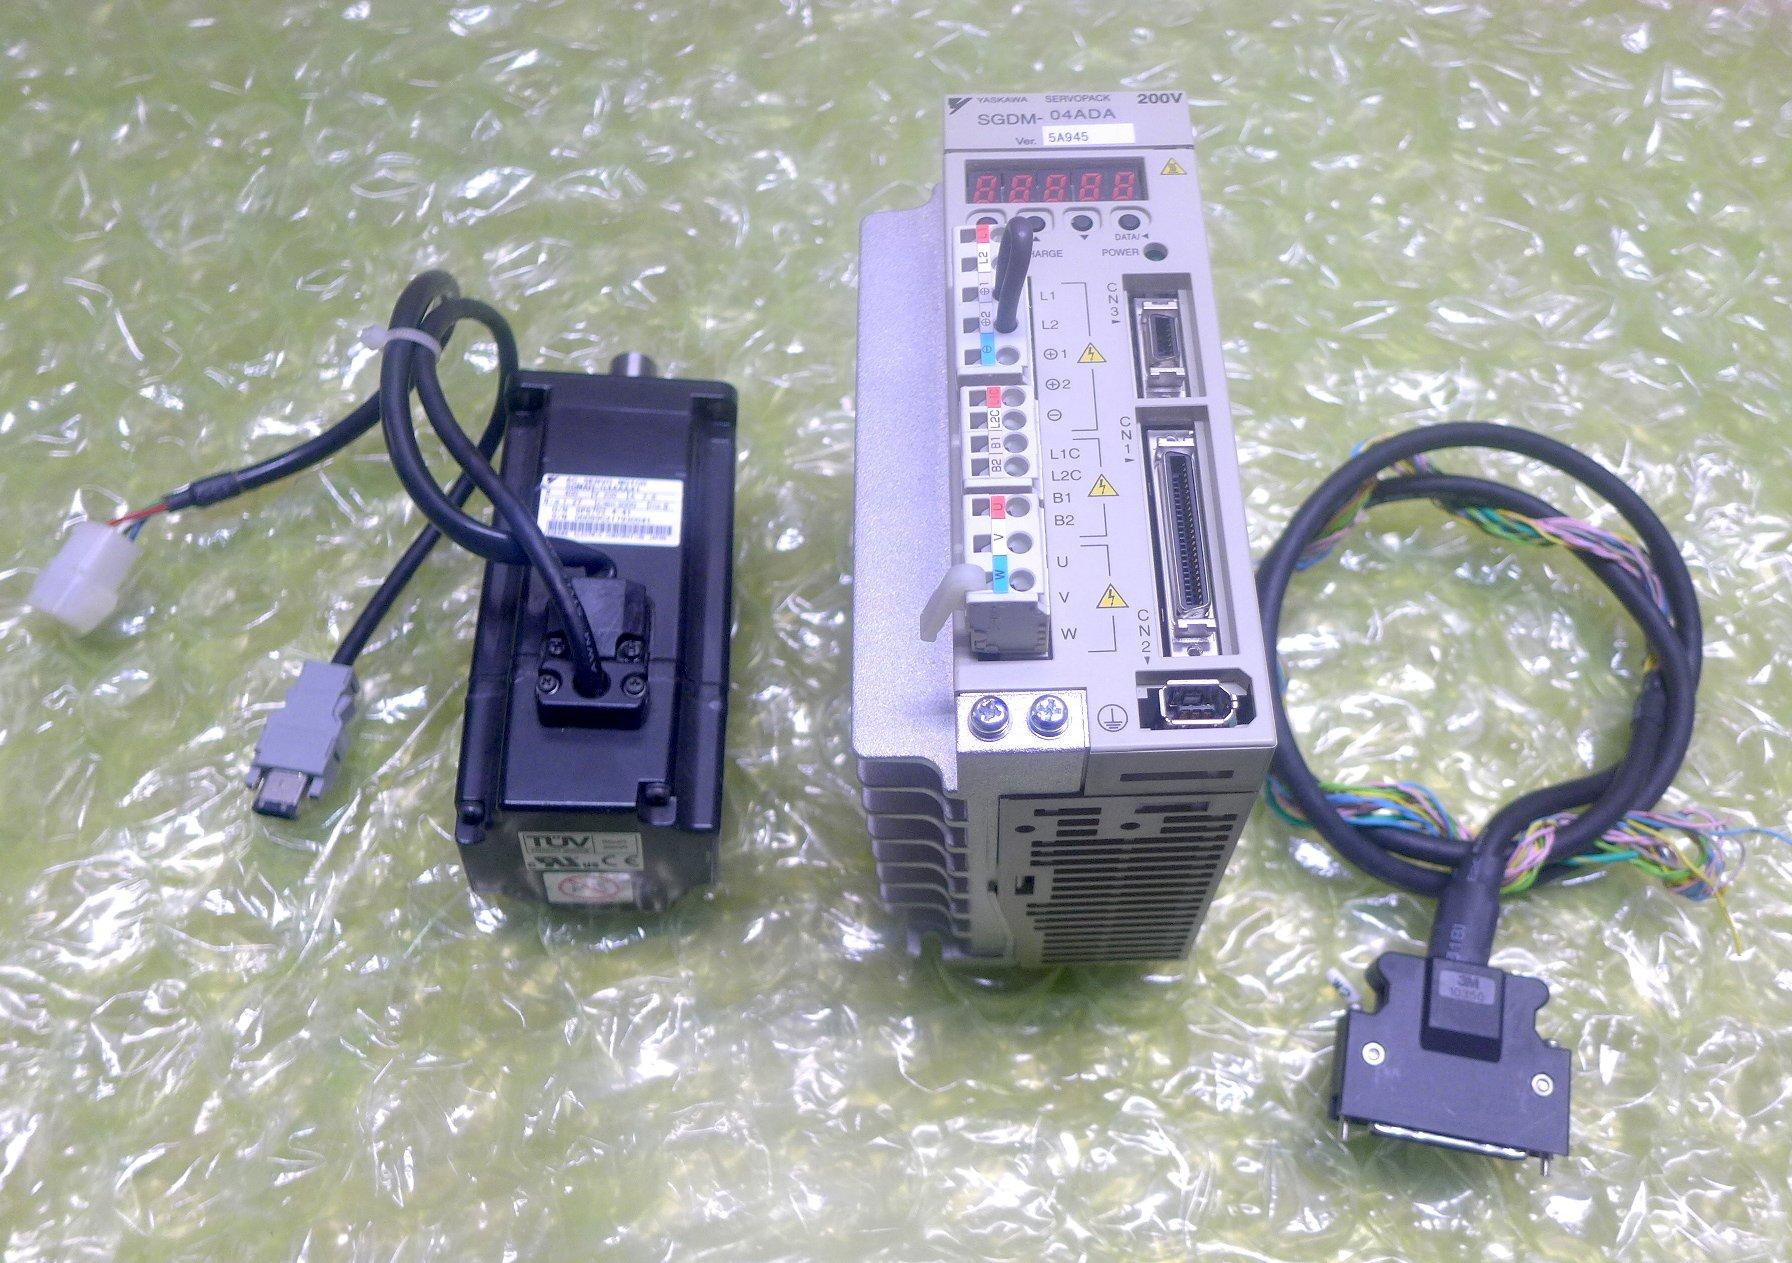 安川YASKAWA SGDM-04ADA SGMJV-04AAA61 SGMAH-04AAA41 PLC 伺服驅動器